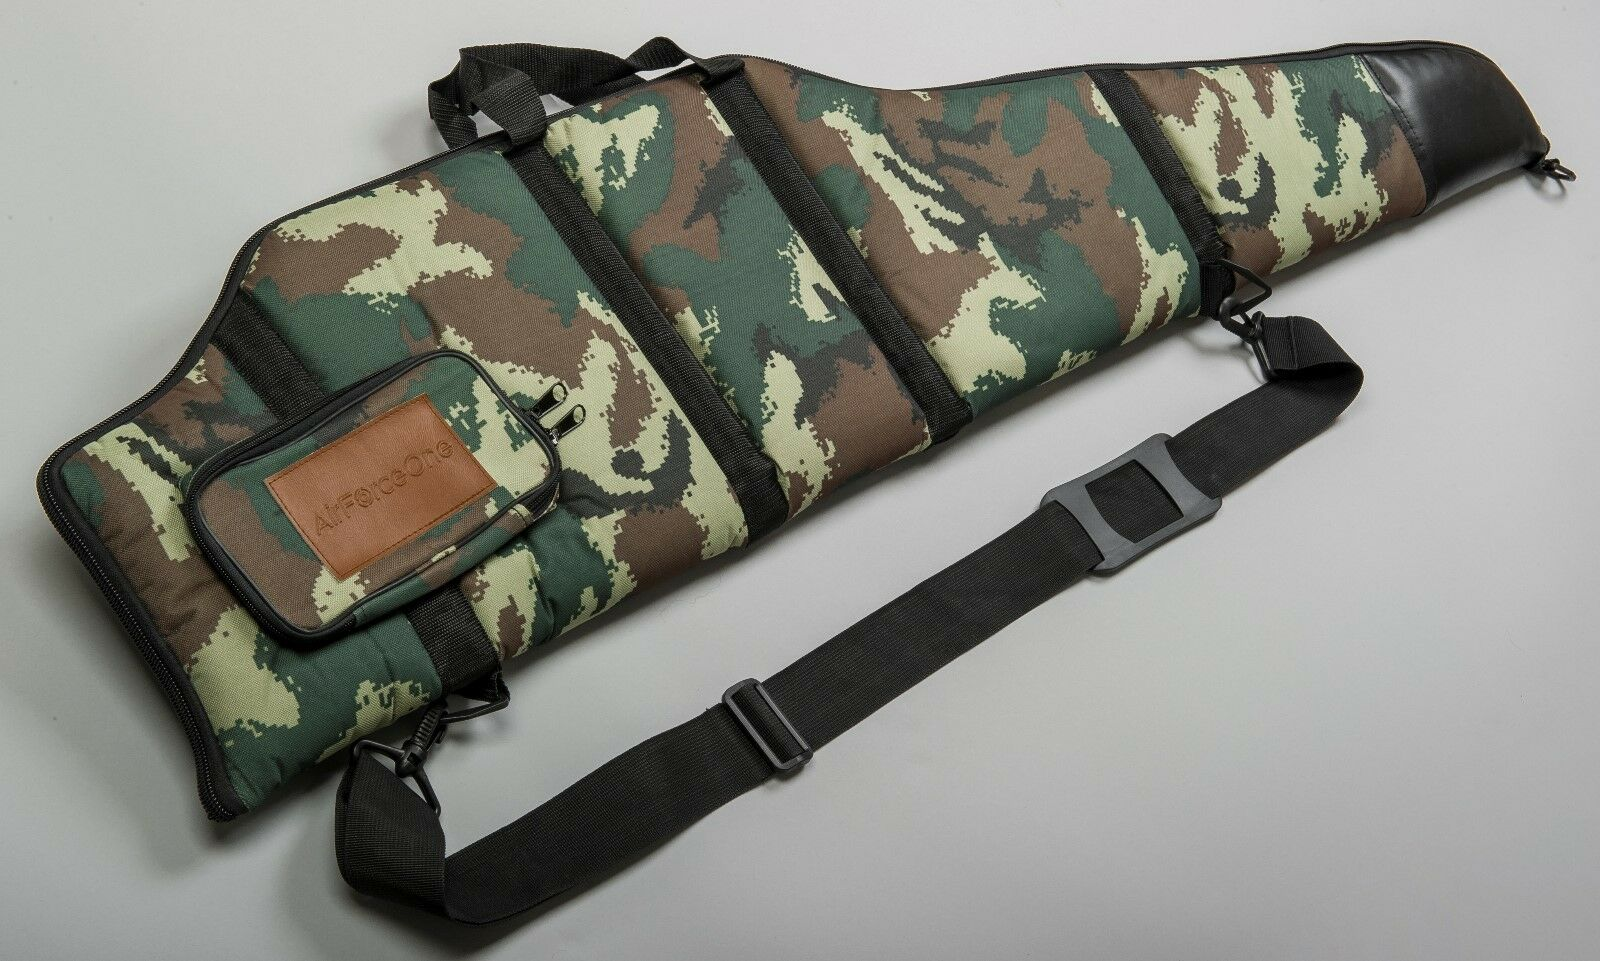 AirForceOne 'Scoped Rifle' 1000D Ballistic Cordura Gun Slip for scoped rifles